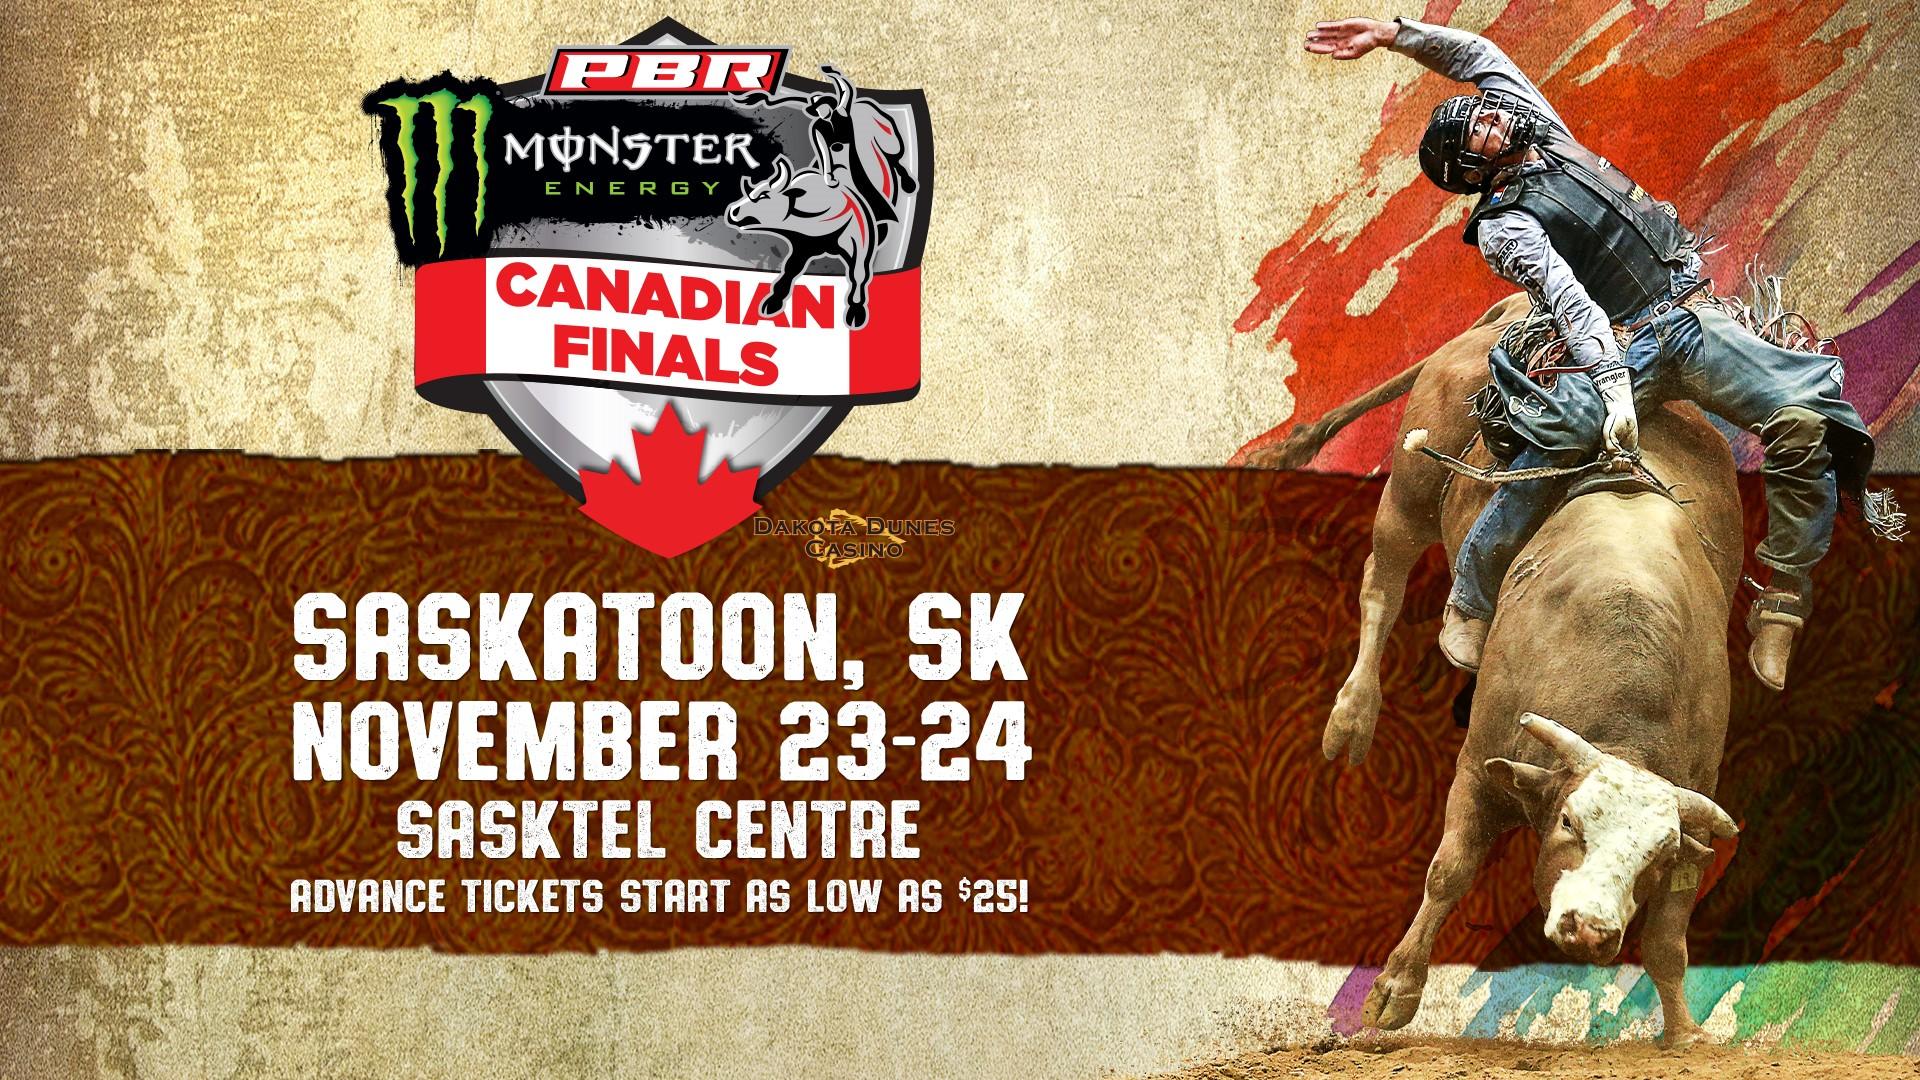 PBR Monster Energy Tour Canadian Finals | ROCK 102